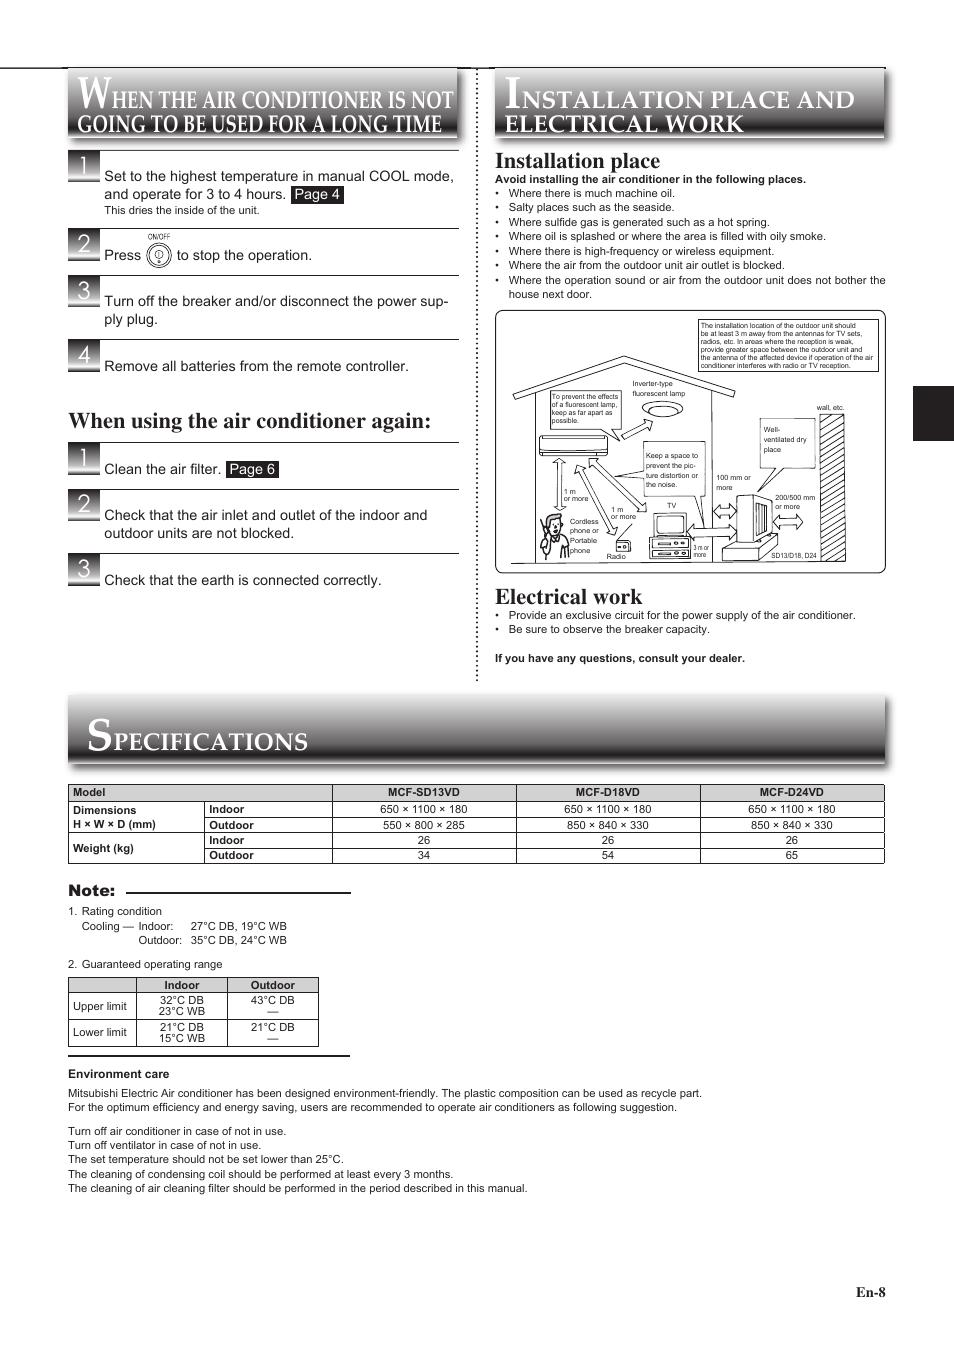 WRG-3991] Mitsubishi Air Conditioner User Manual